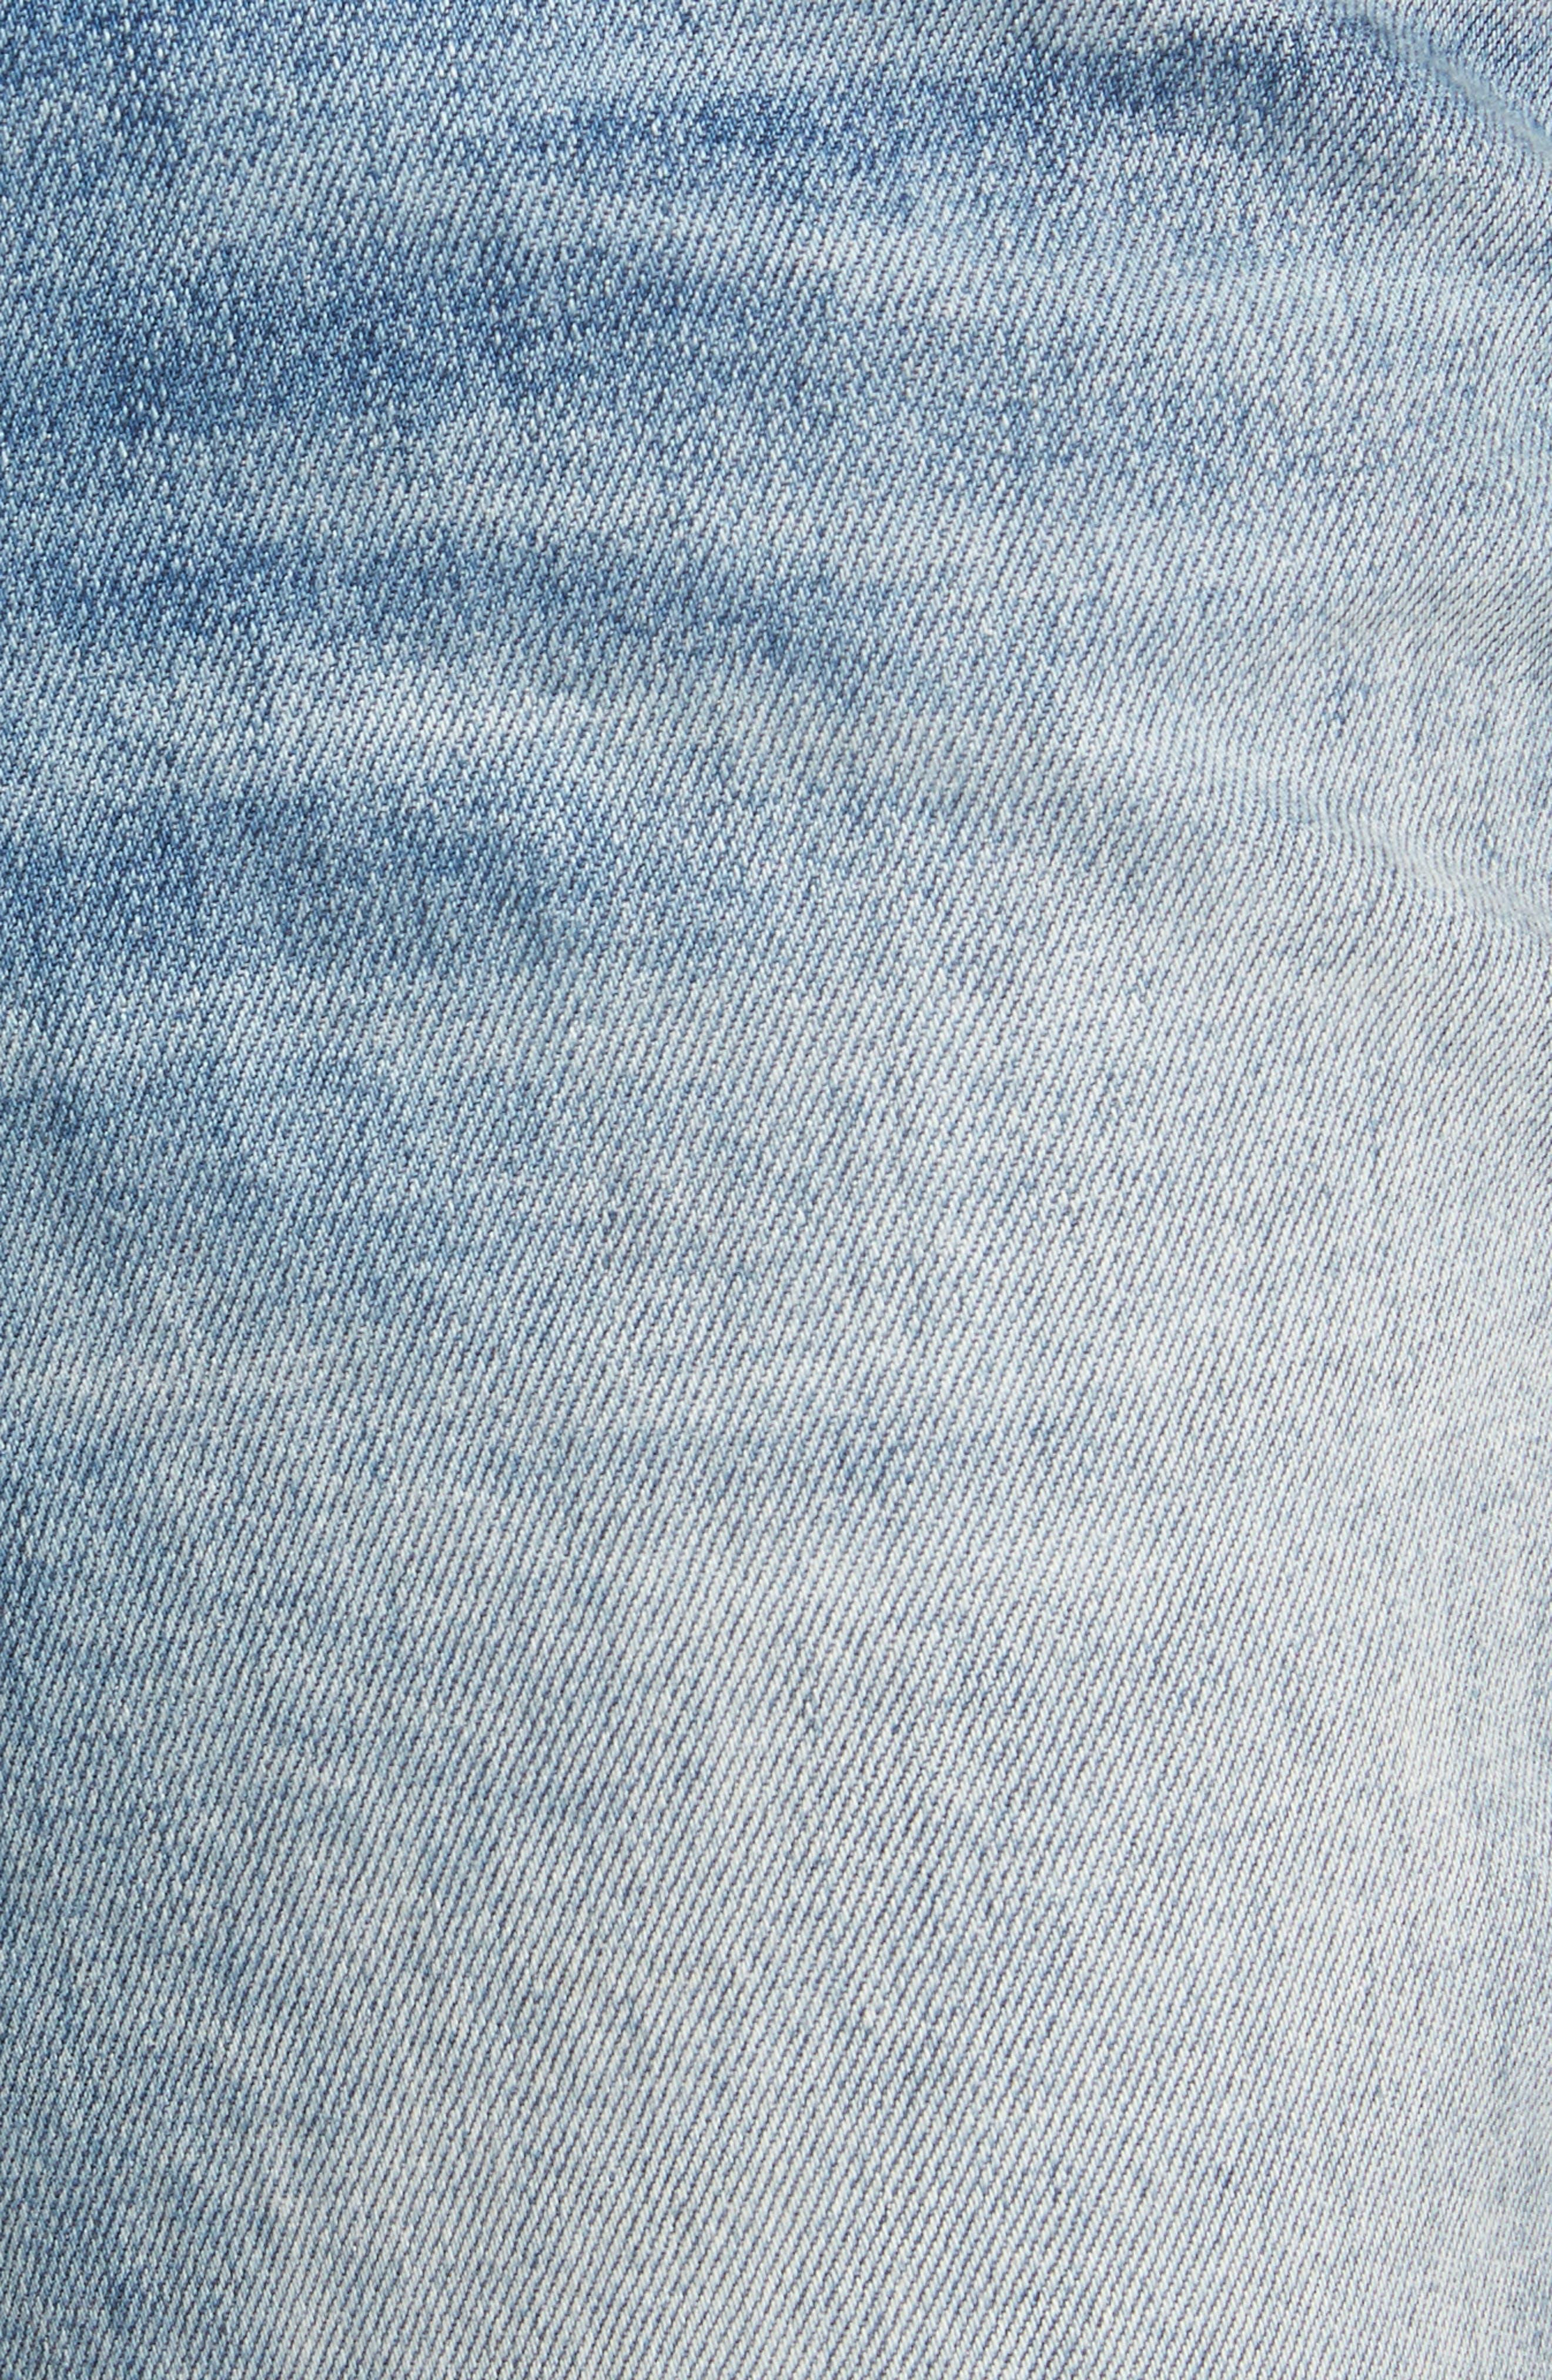 Loose Fit Slim Jeans,                             Alternate thumbnail 5, color,                             400